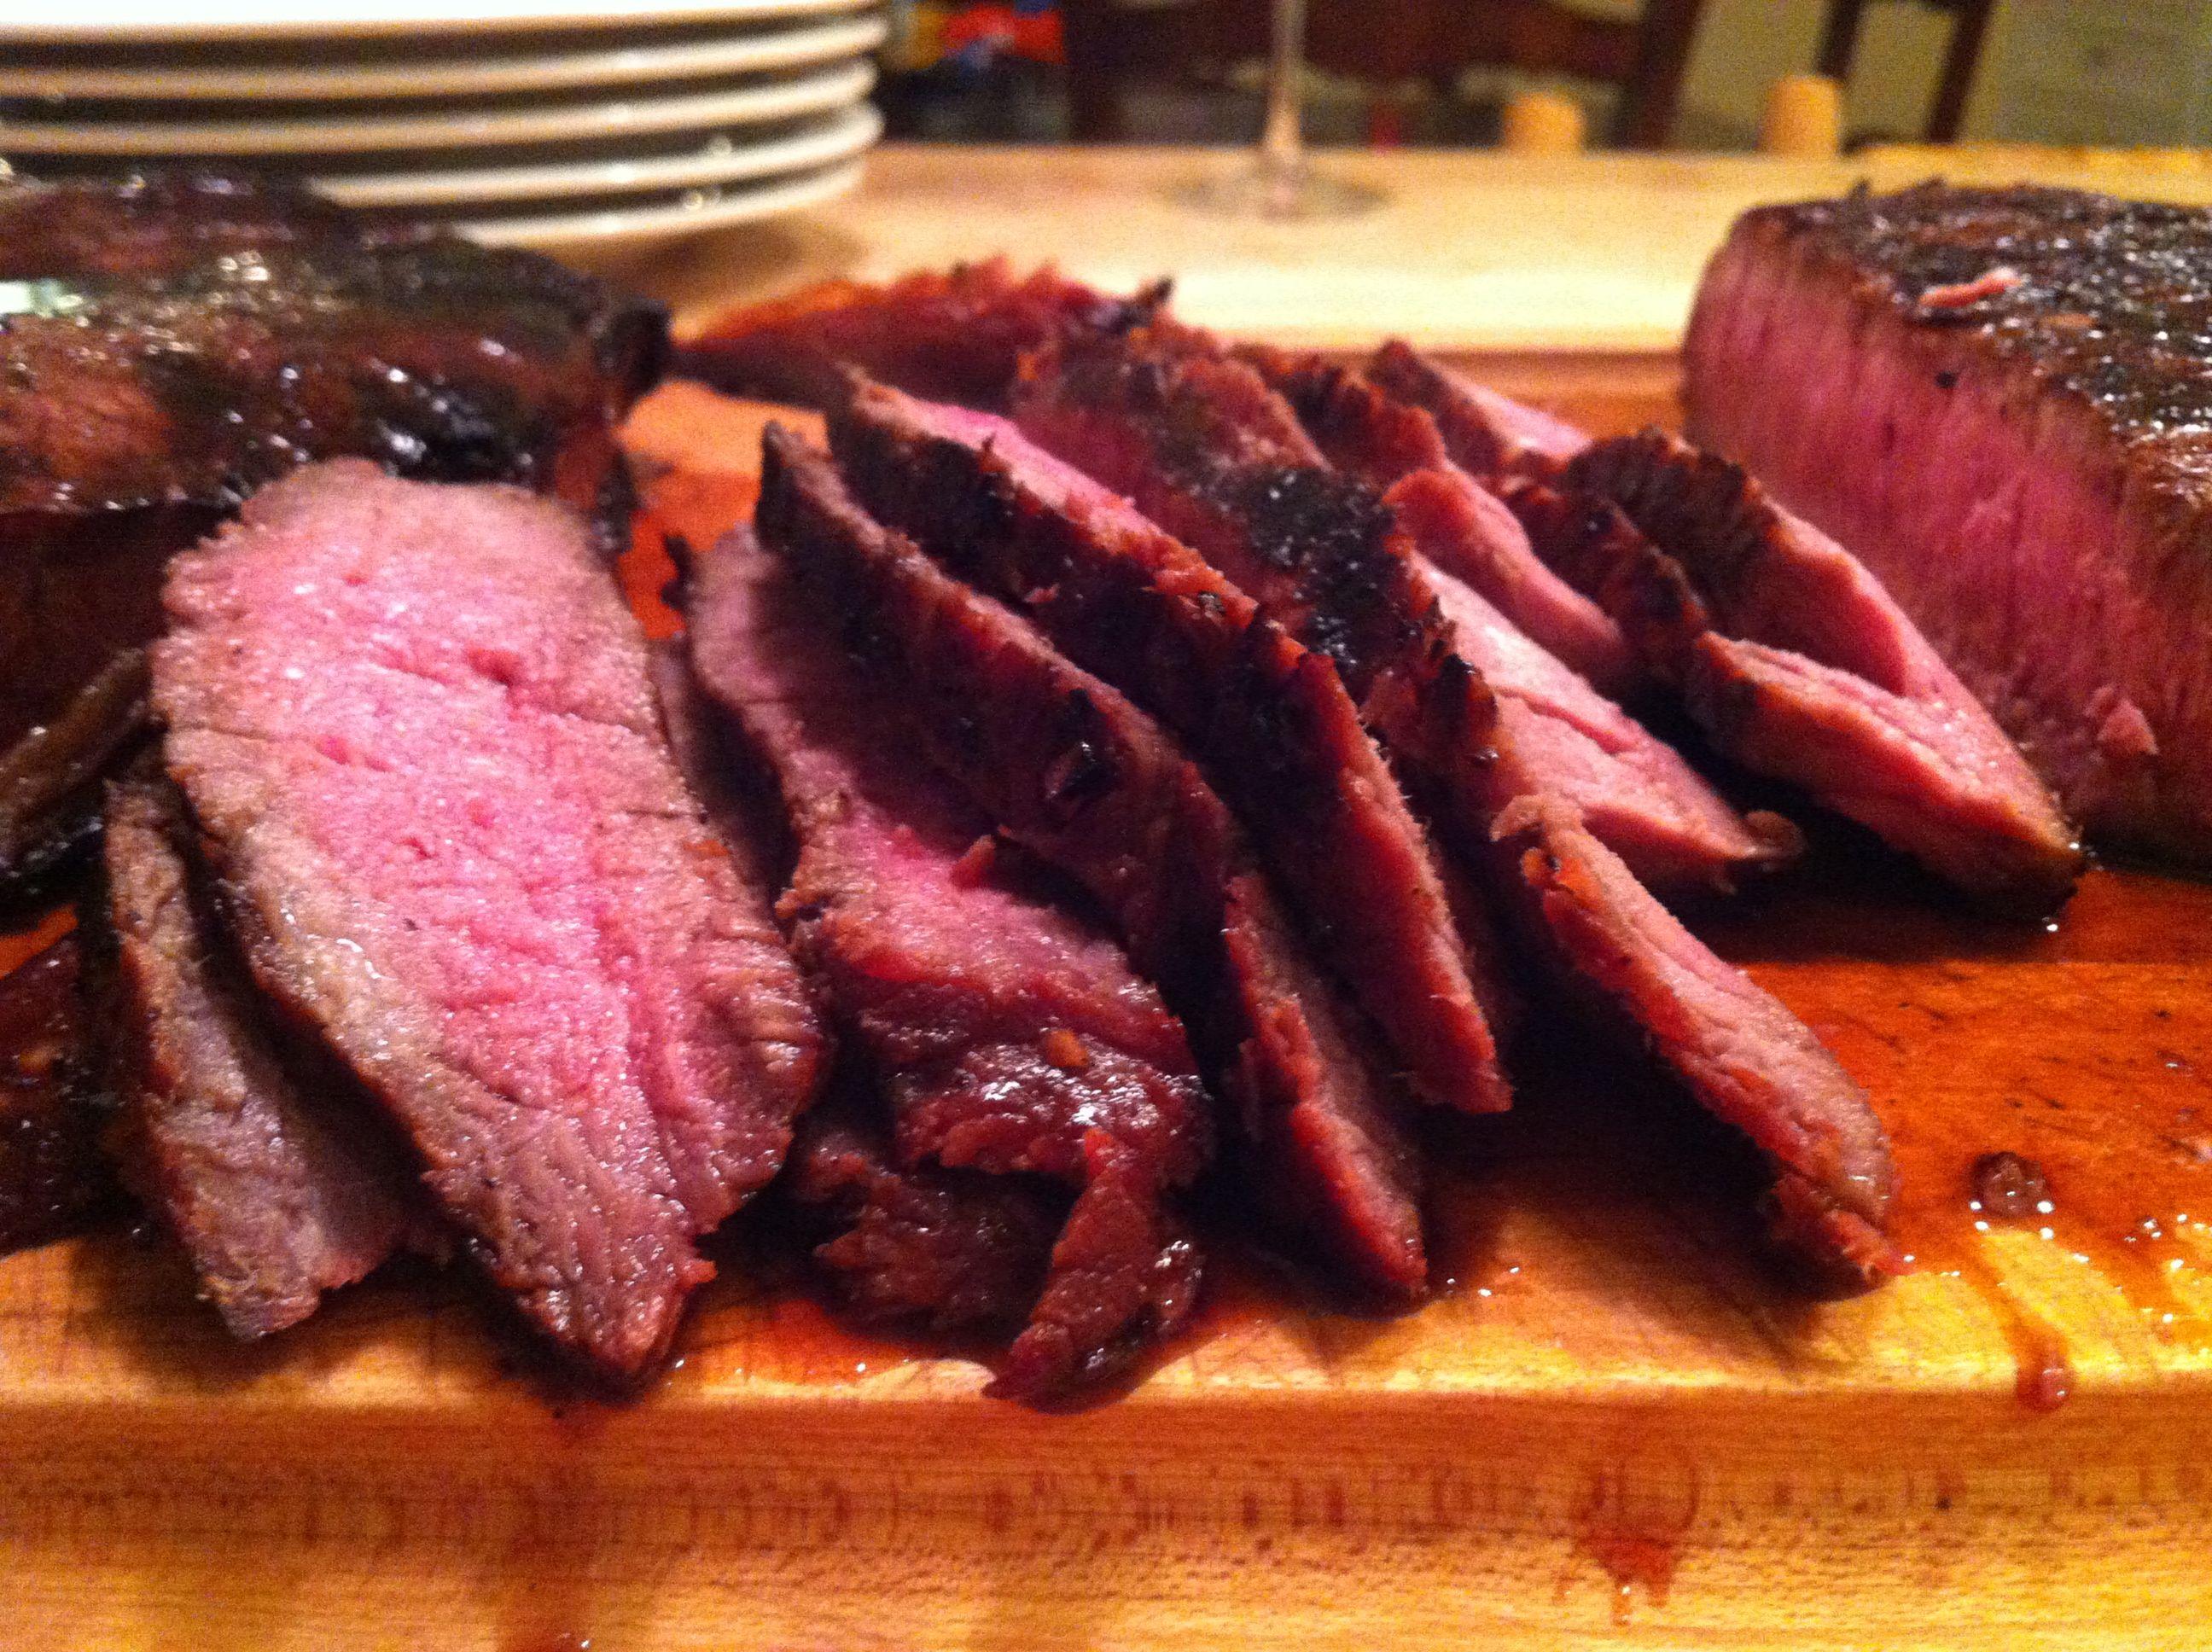 November 4 2012 Beef Steak Recipes Coleslaw For Pulled Pork Fall Dinner Menu